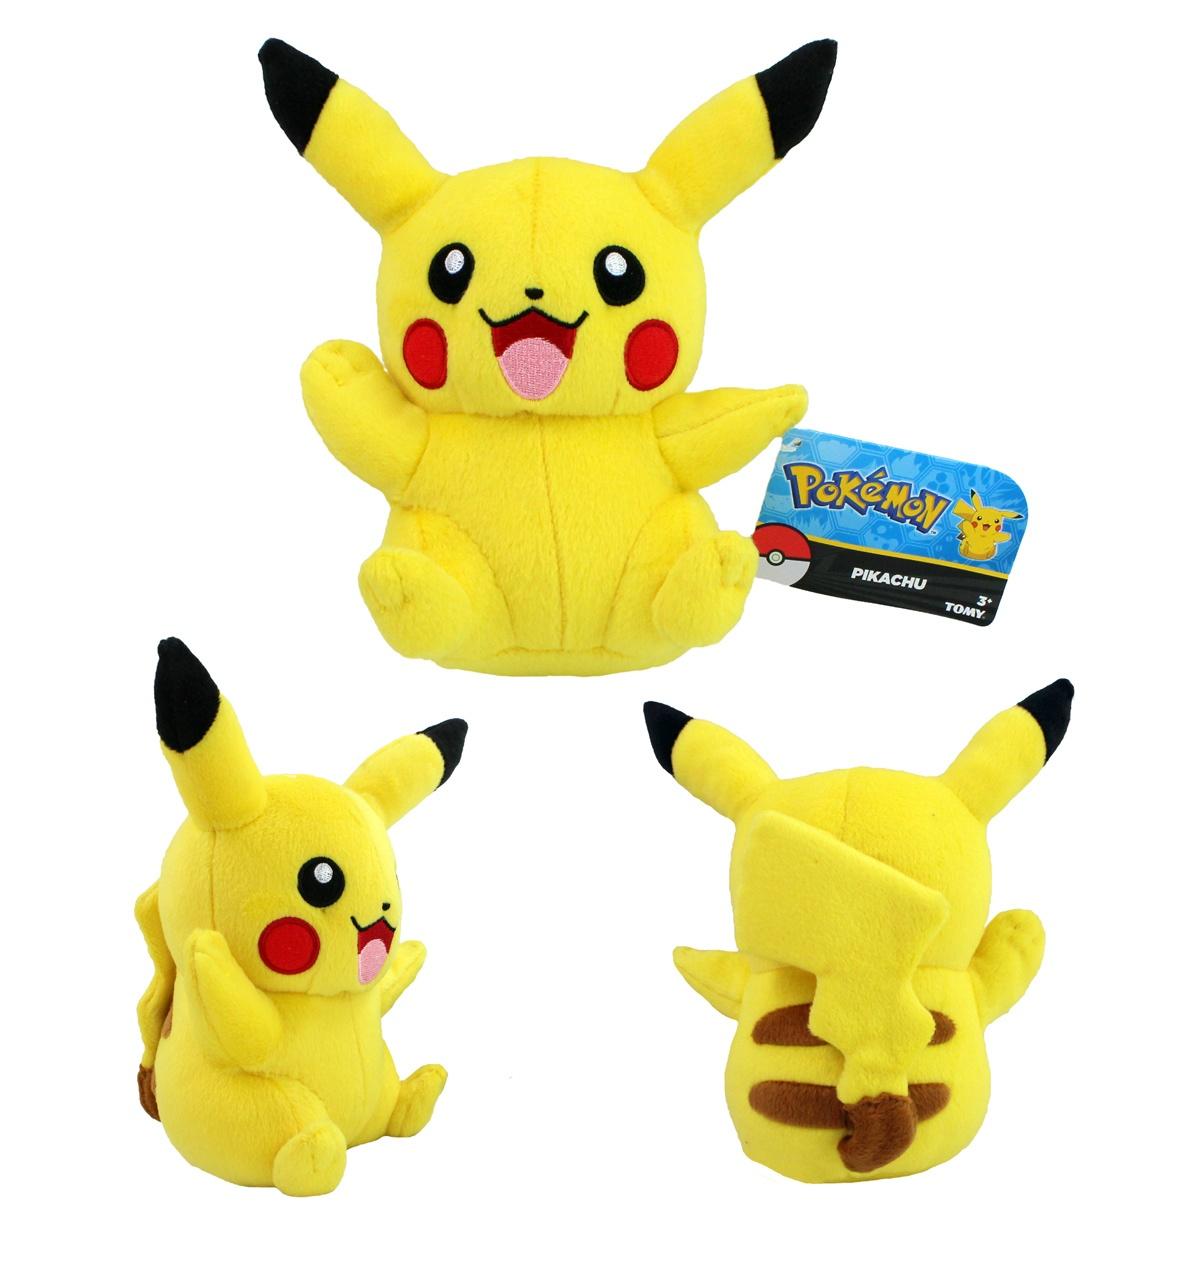 Pokemon Pikachu ca 20 cm